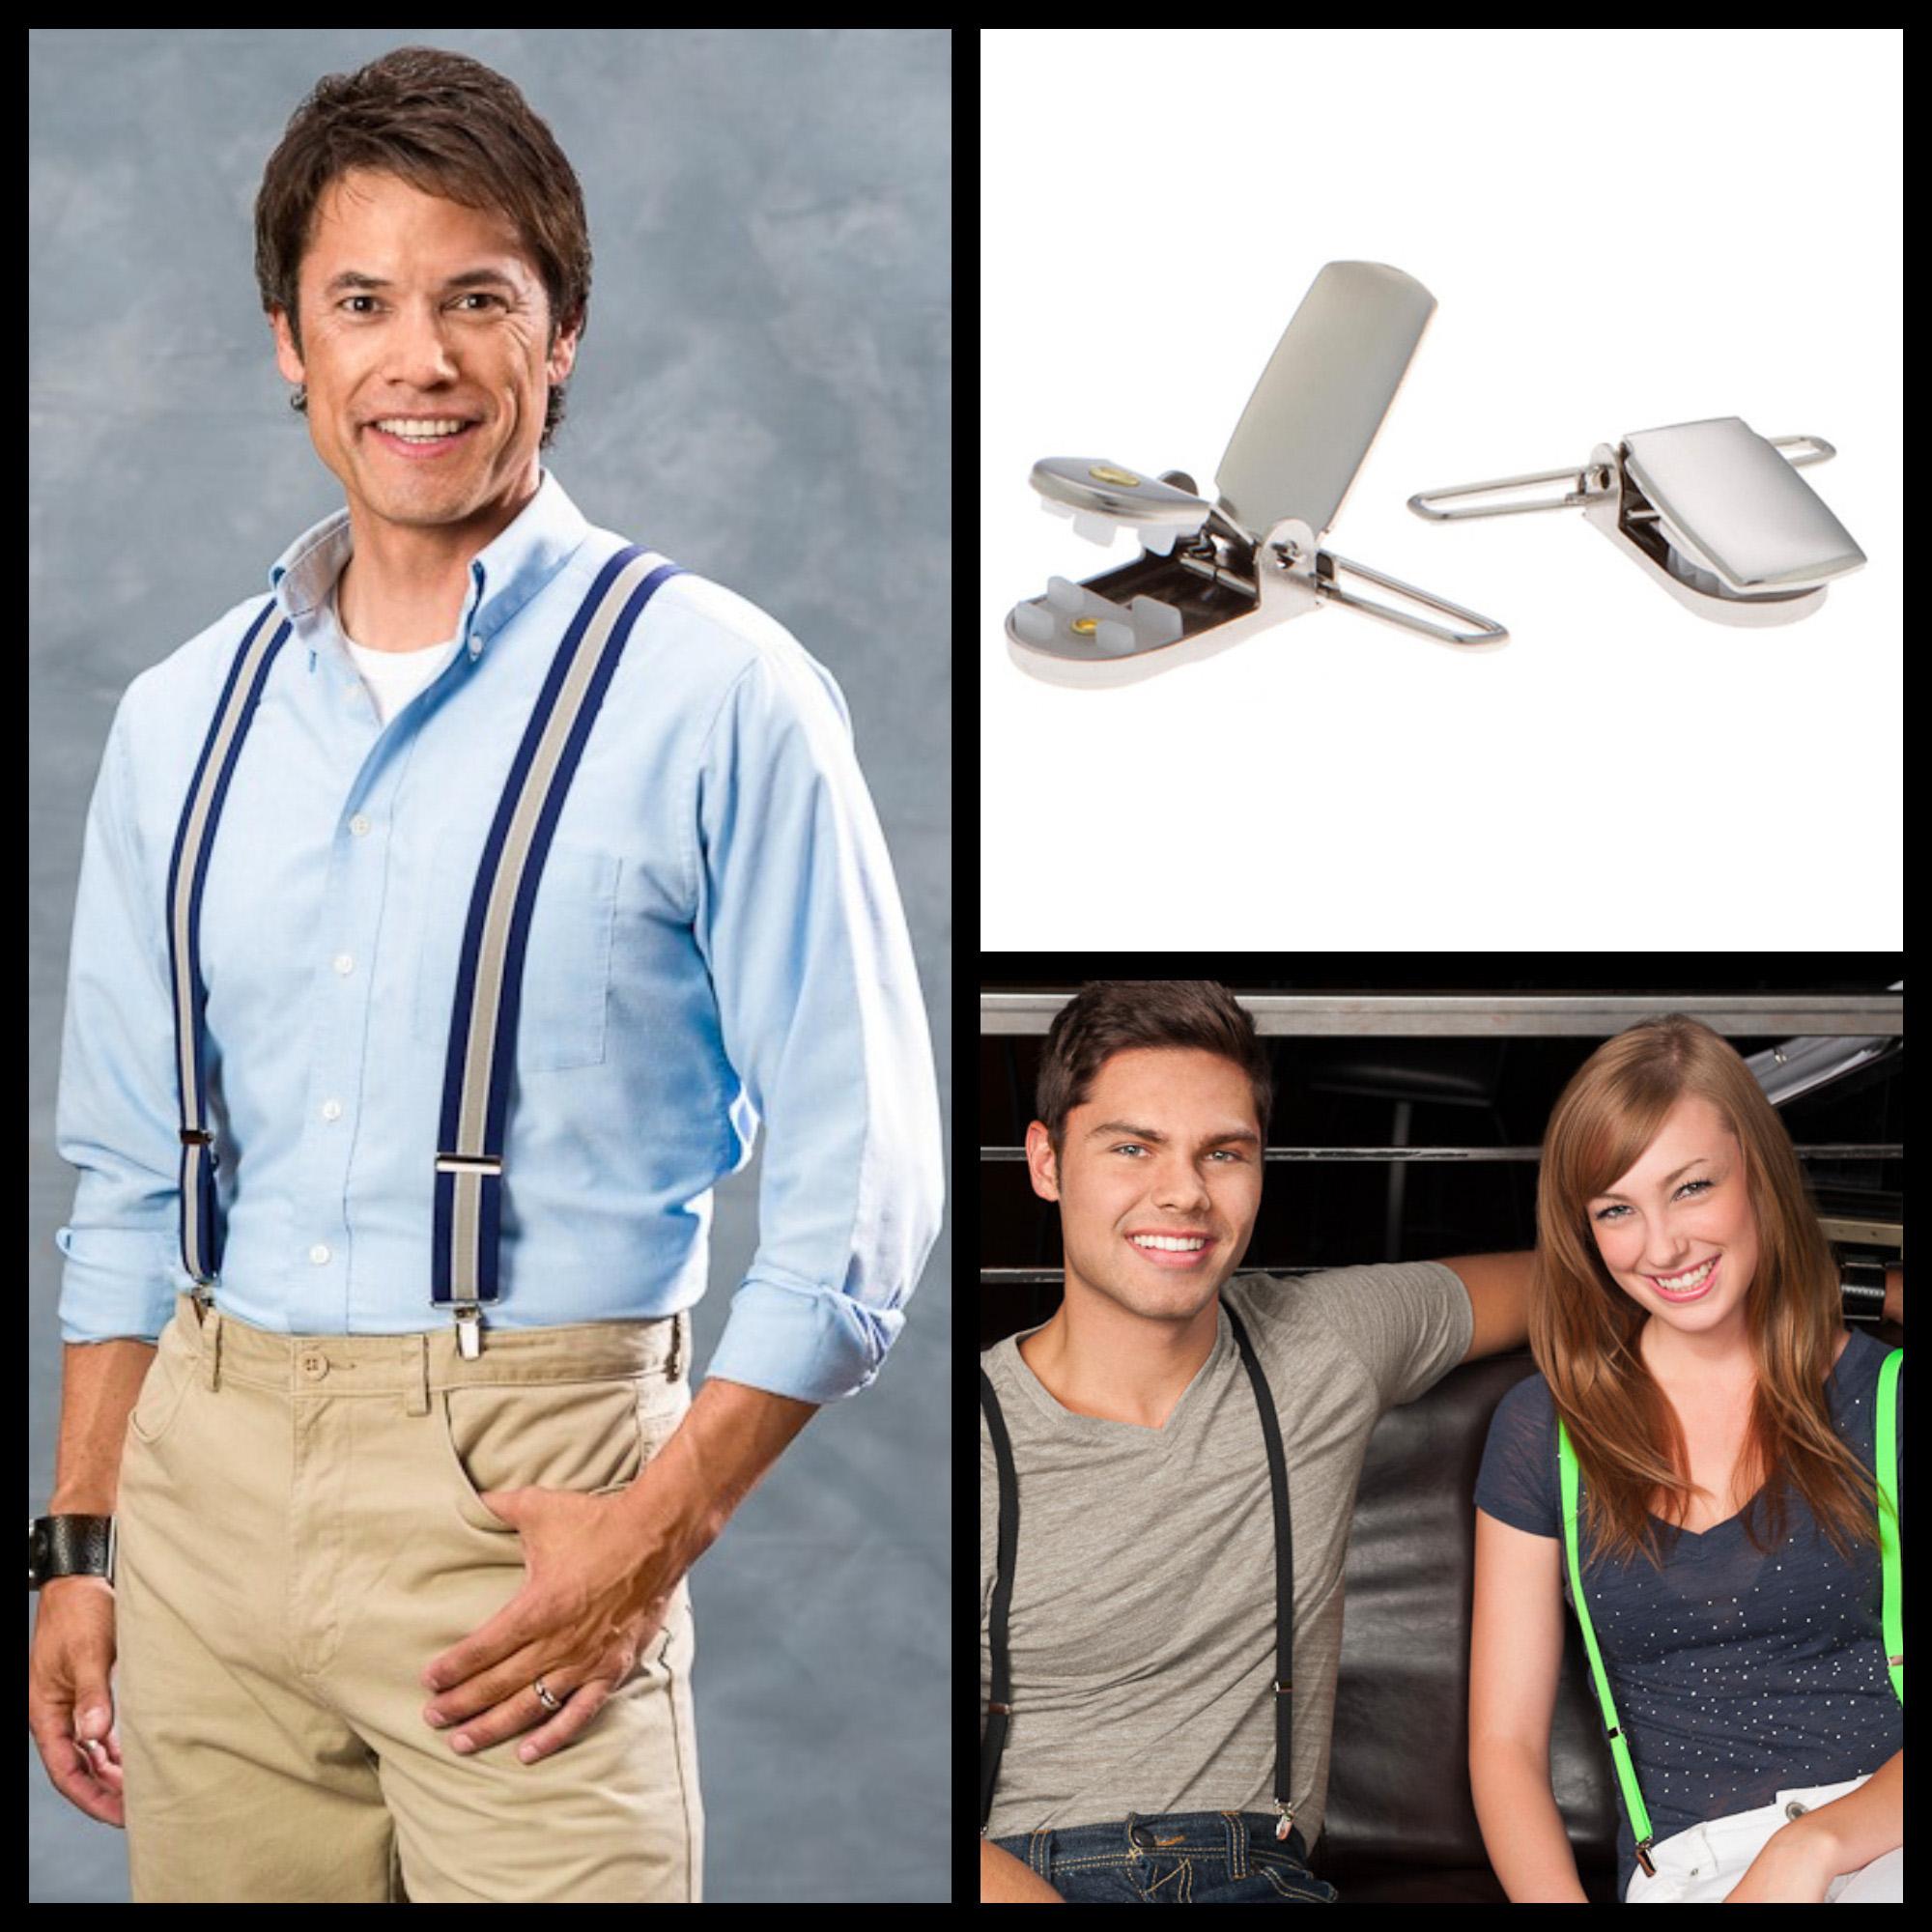 finger-clip-suspenders.jpg